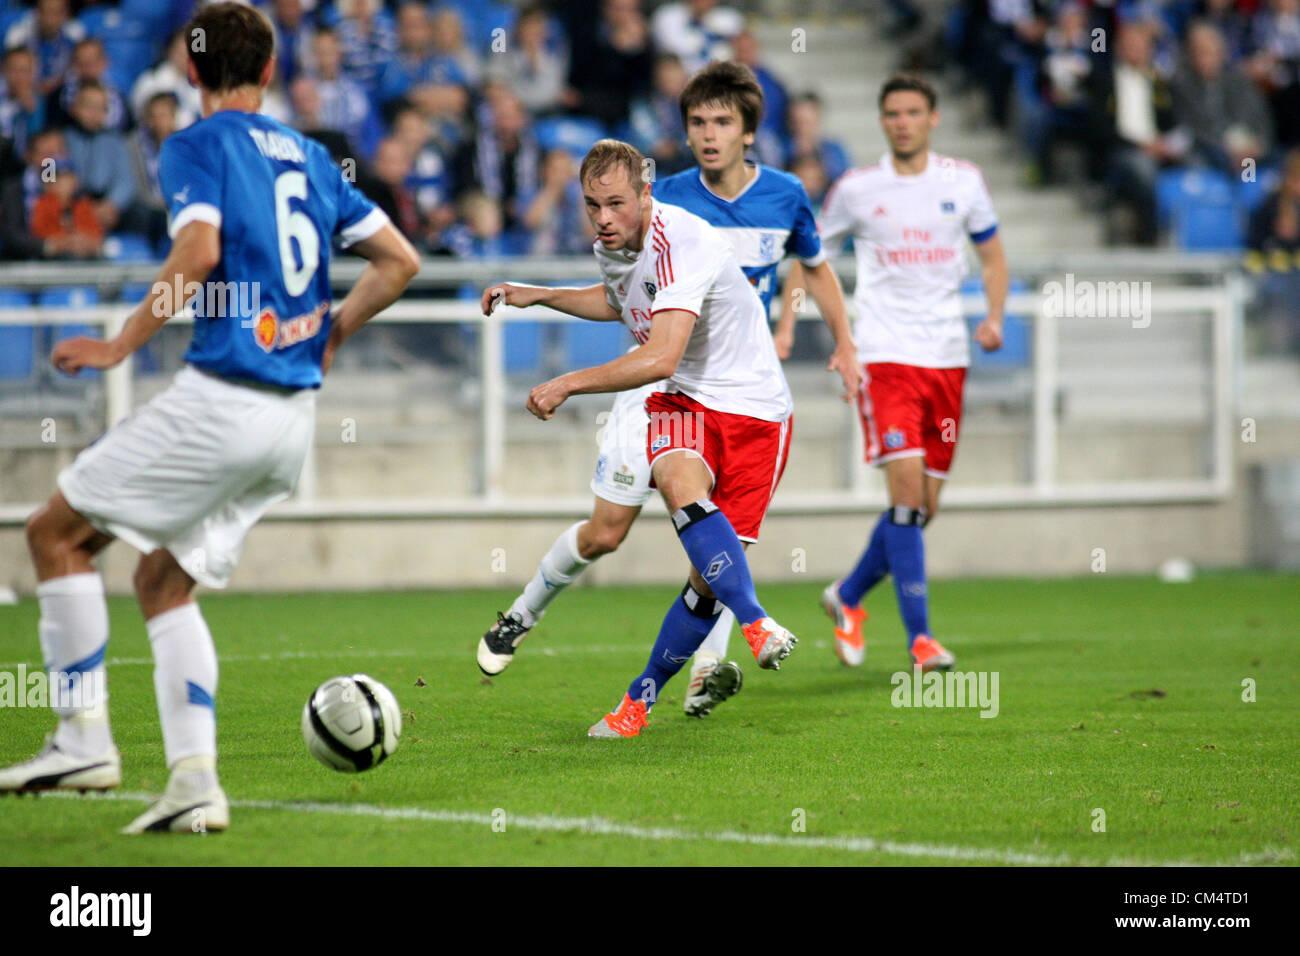 03.10.2012. Poznan, Poland, UEFA Champions League football. Lech Poznan, versus Hamburg.  MAXIMILIAN BEISTER (HSV) - Stock Image